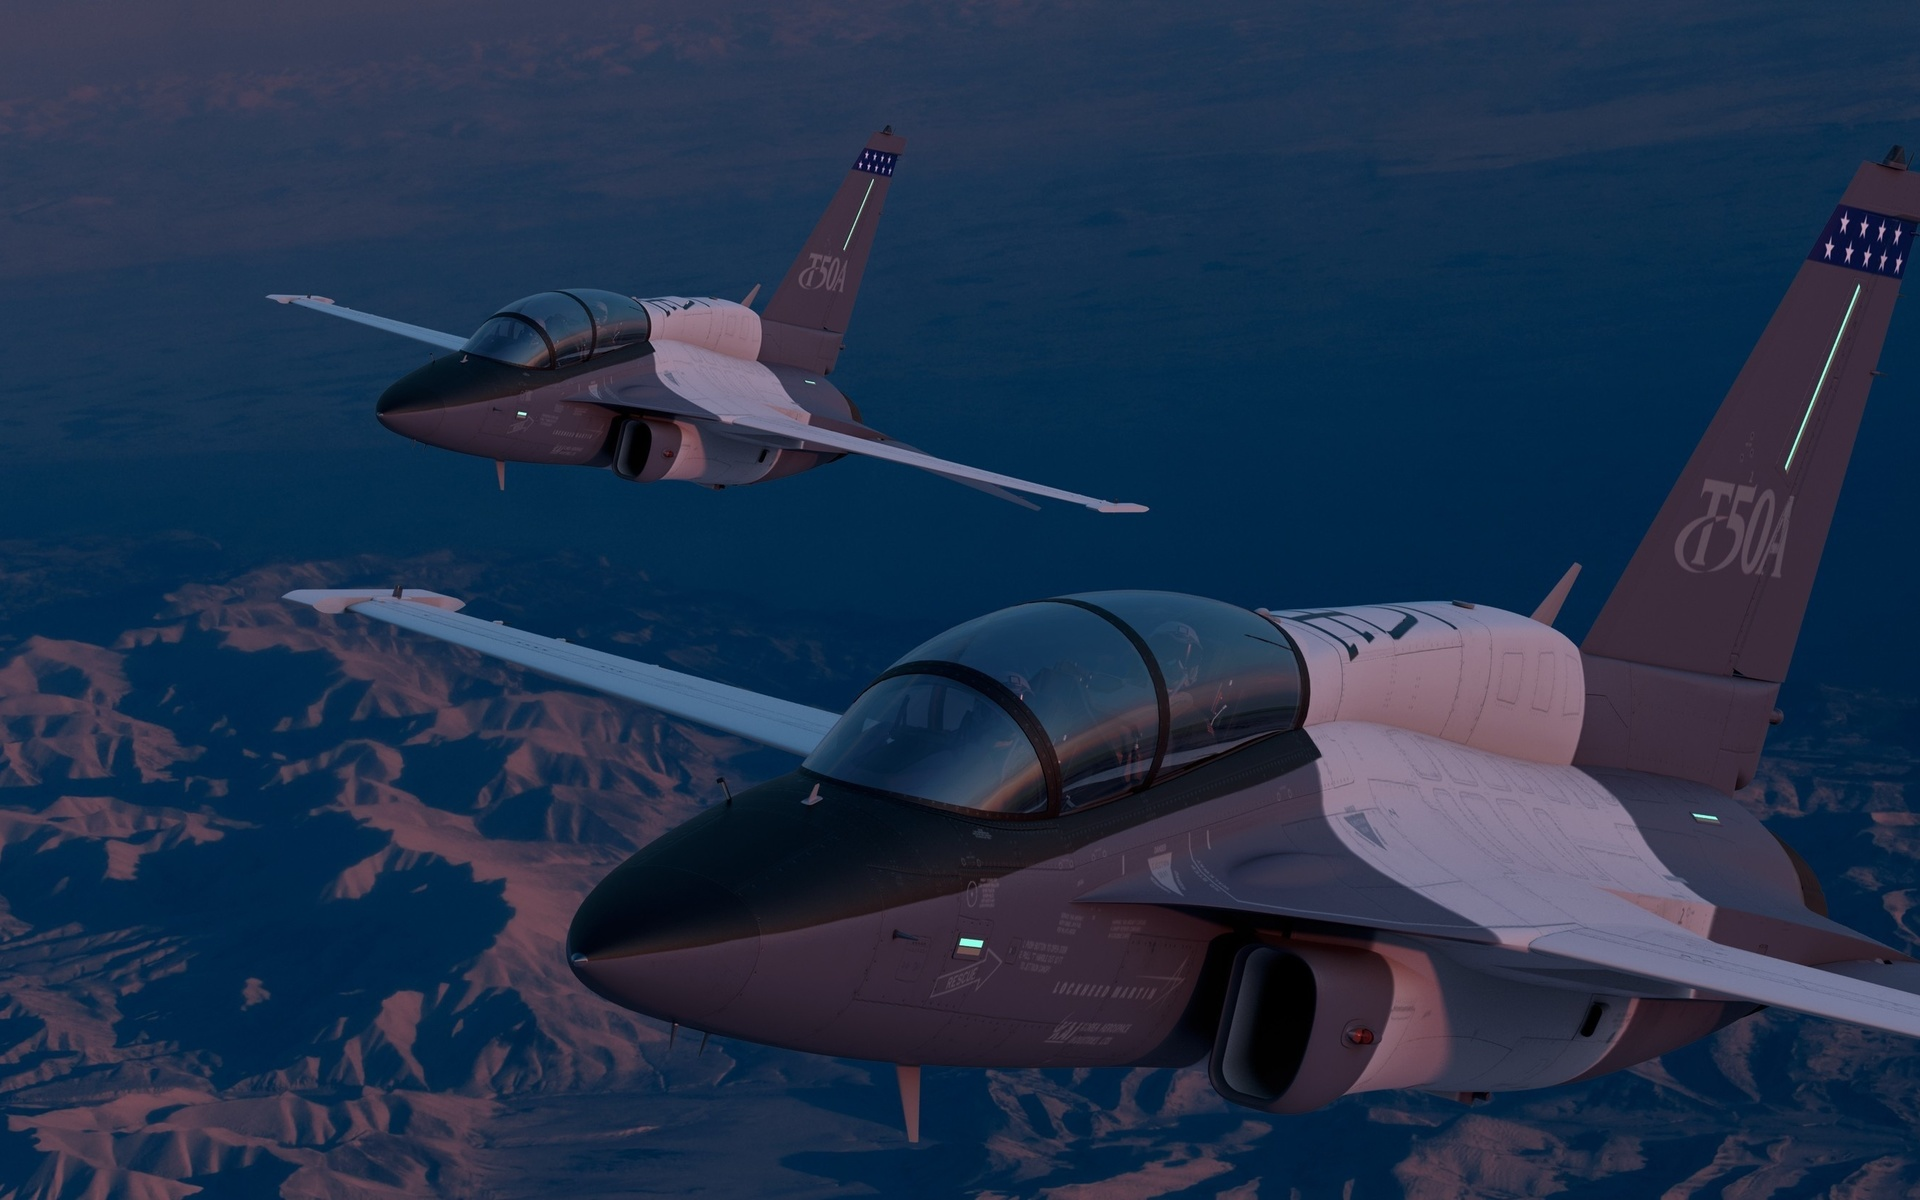 авиация, боевые самолёты, lockheed, martin, пилоты, кабина, полёт, t-50a, ландшафт, учебно-боевой, вечер, самолёт